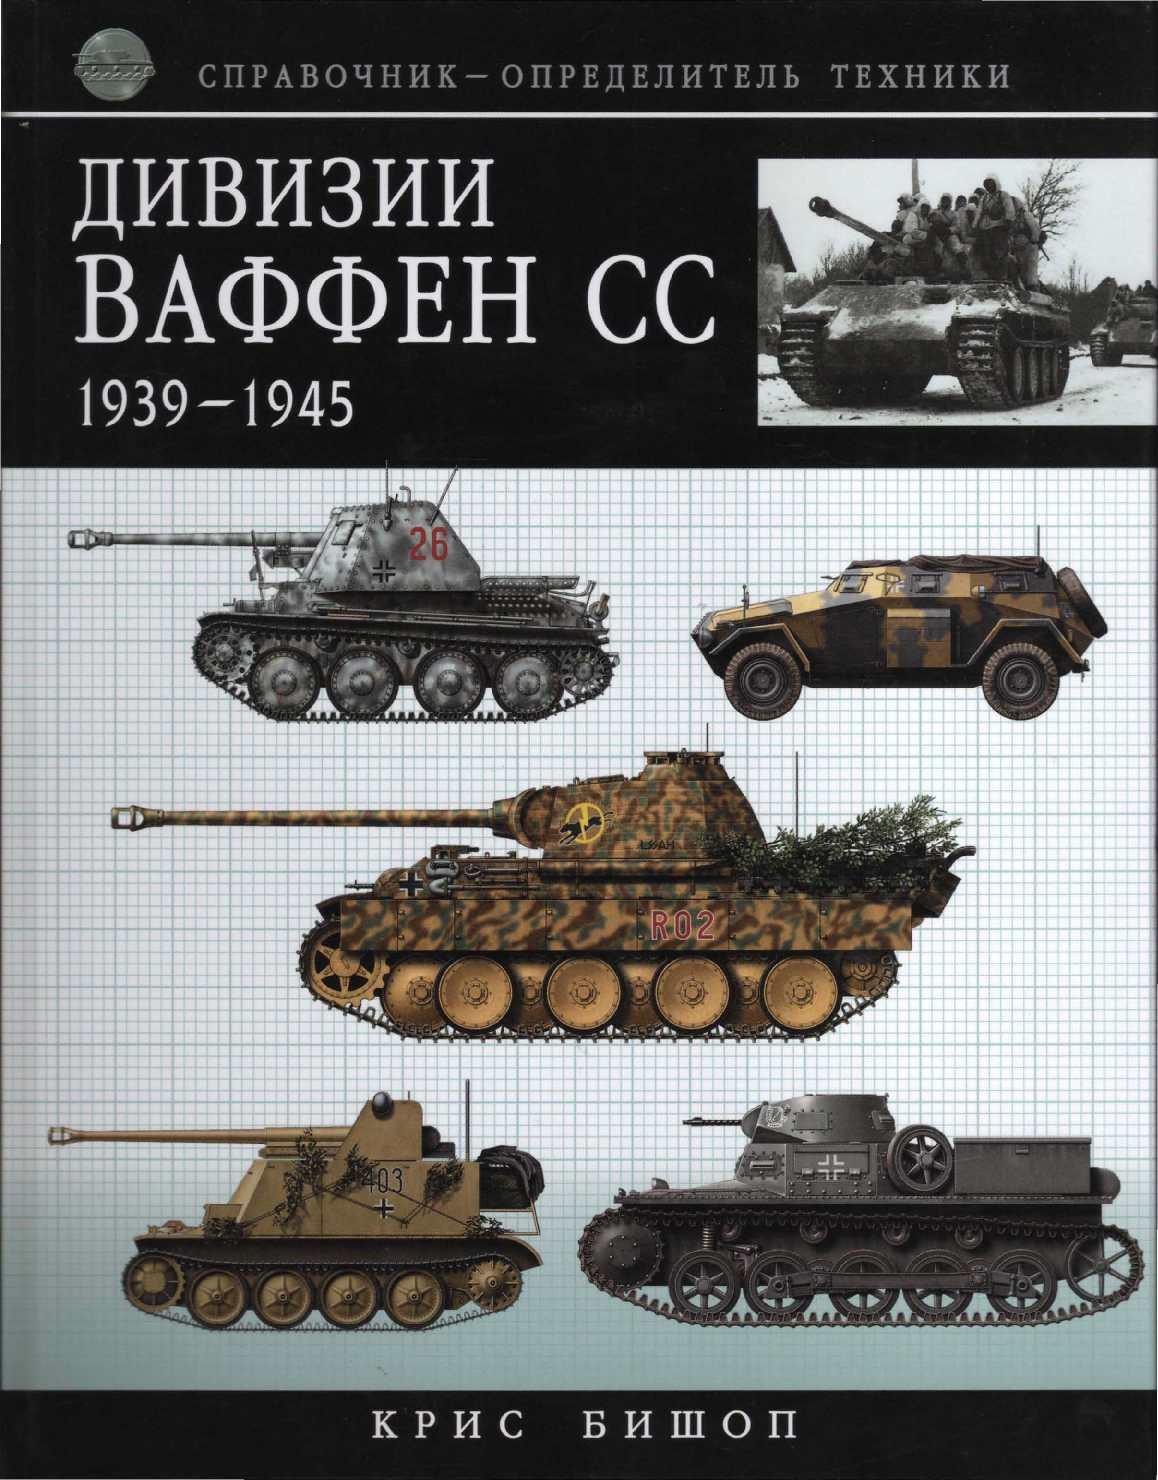 Дивизии Ваффен СС (1939-1945) / К. Бишоп. - М. : Эксмо, 2009.